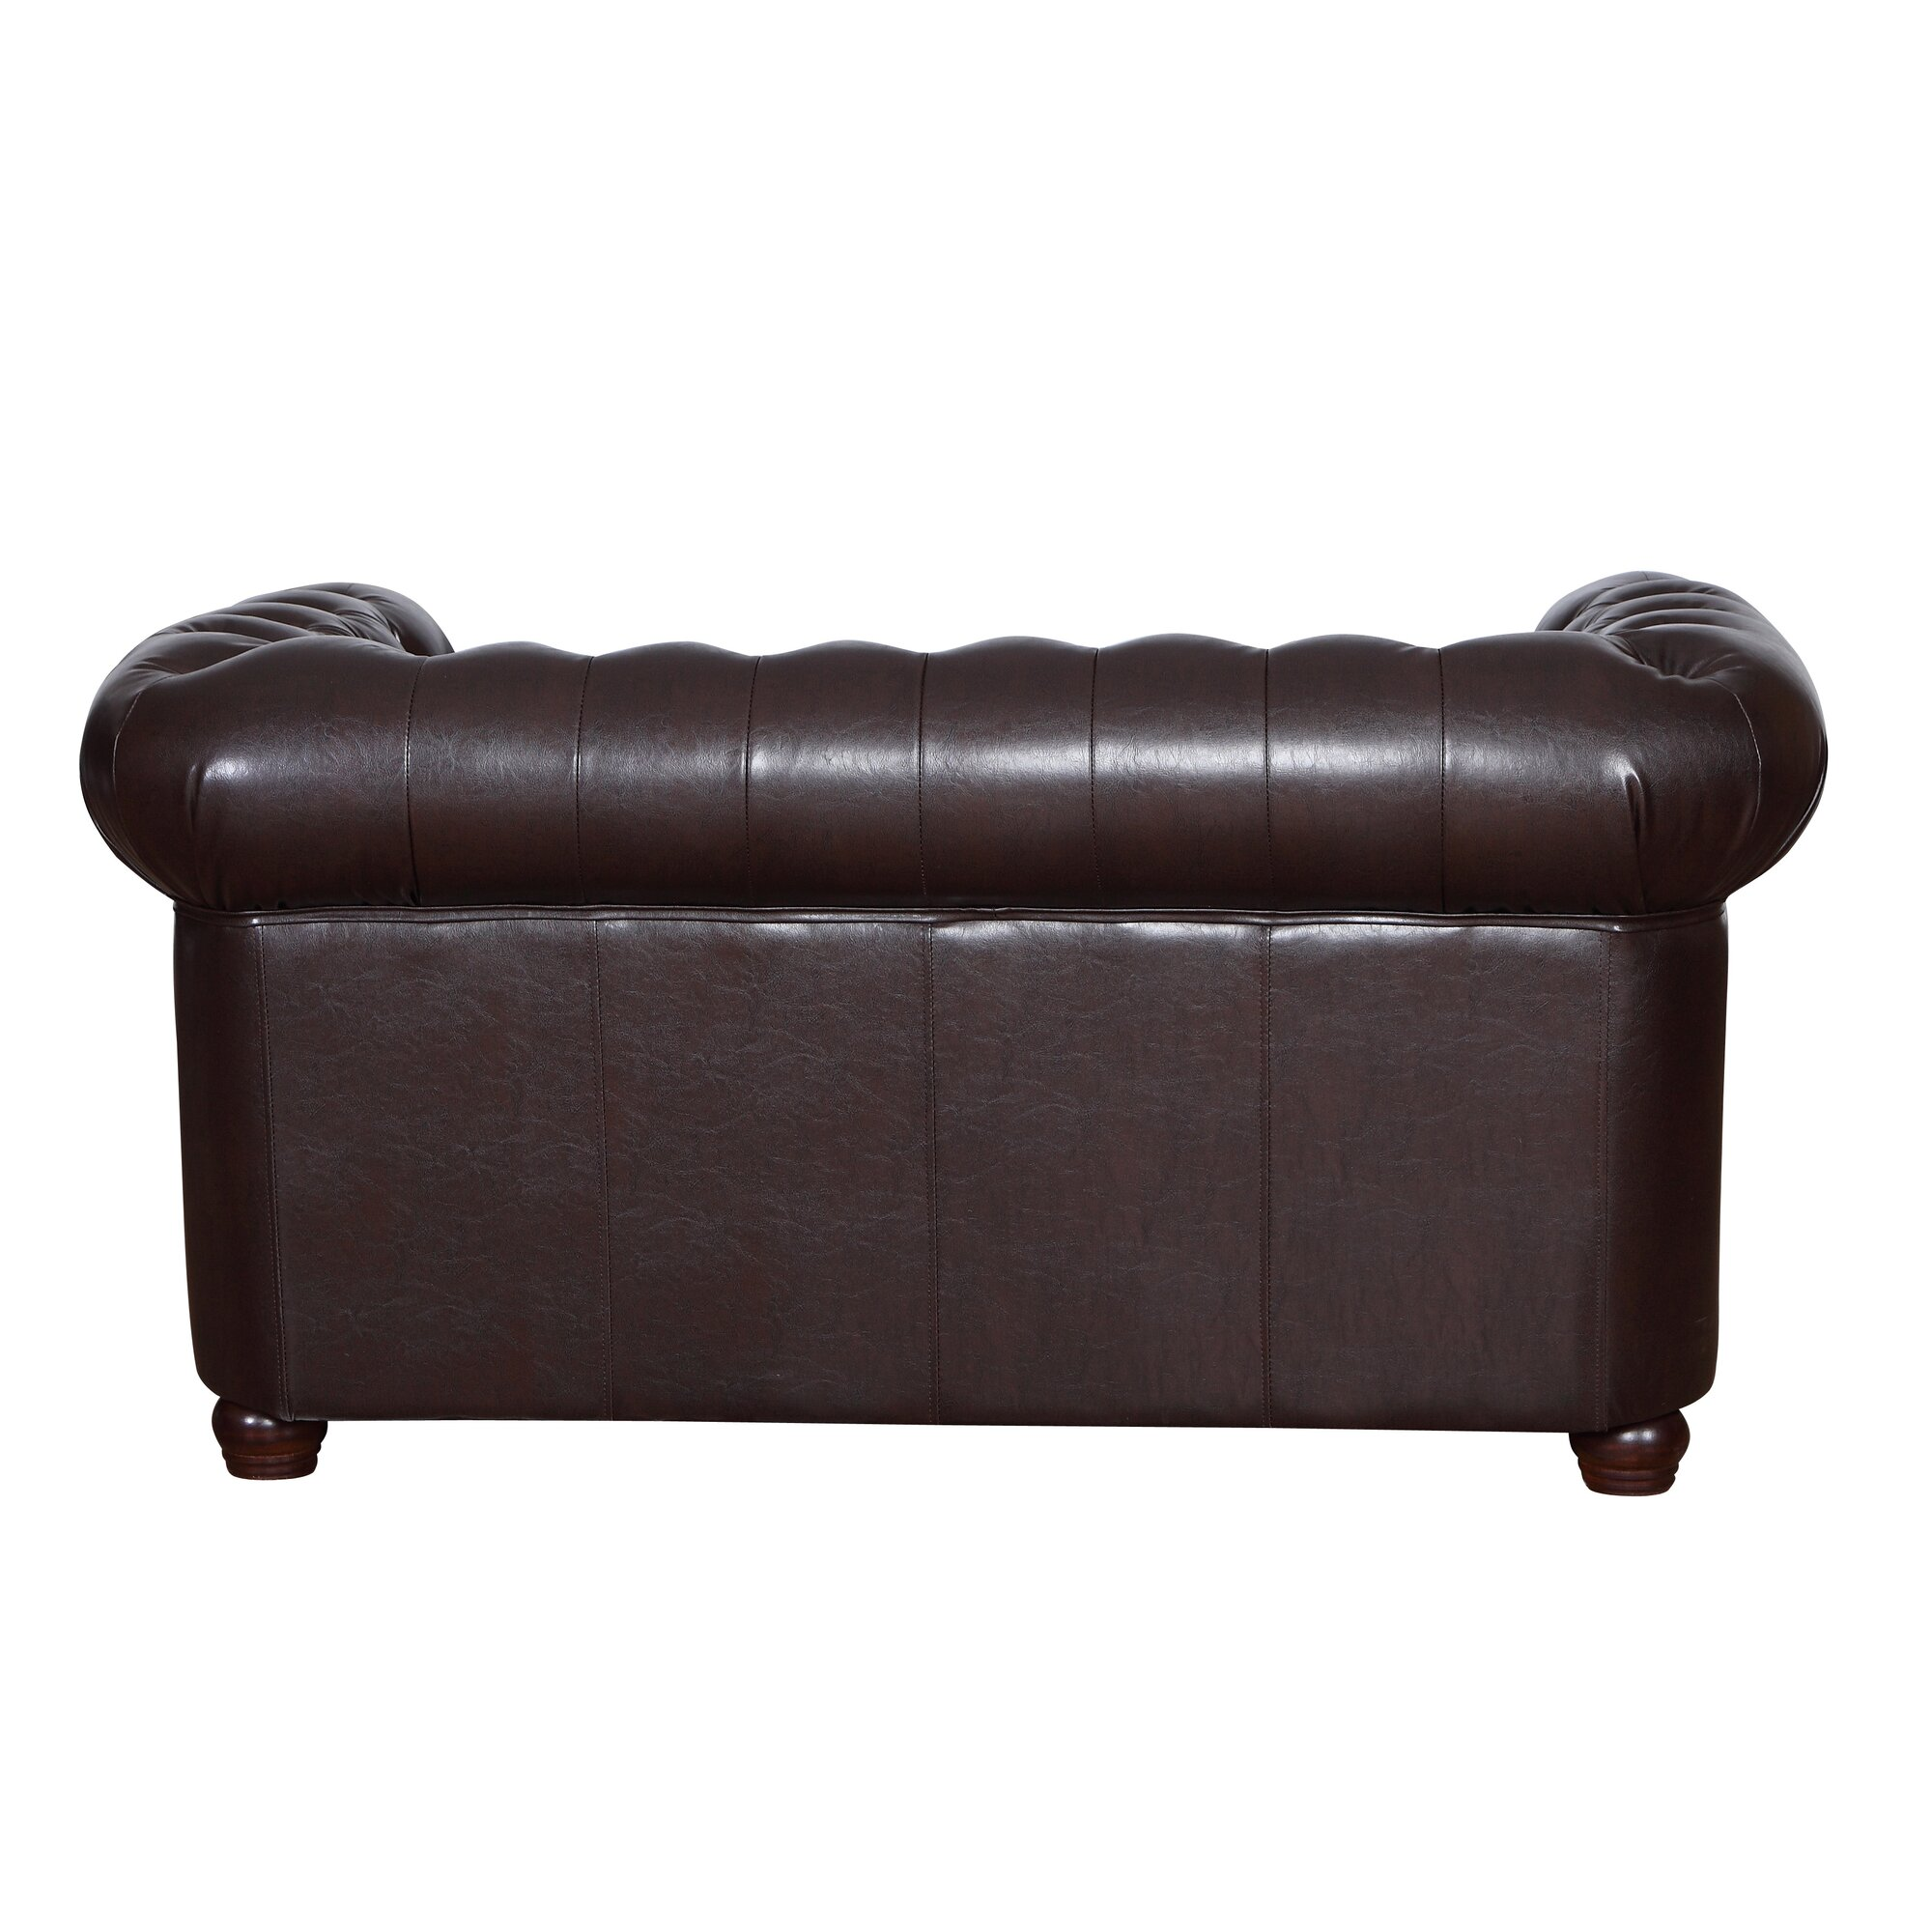 Home haus 2 sitzer chesterfield sofa york for Sofa york 3 sitzer